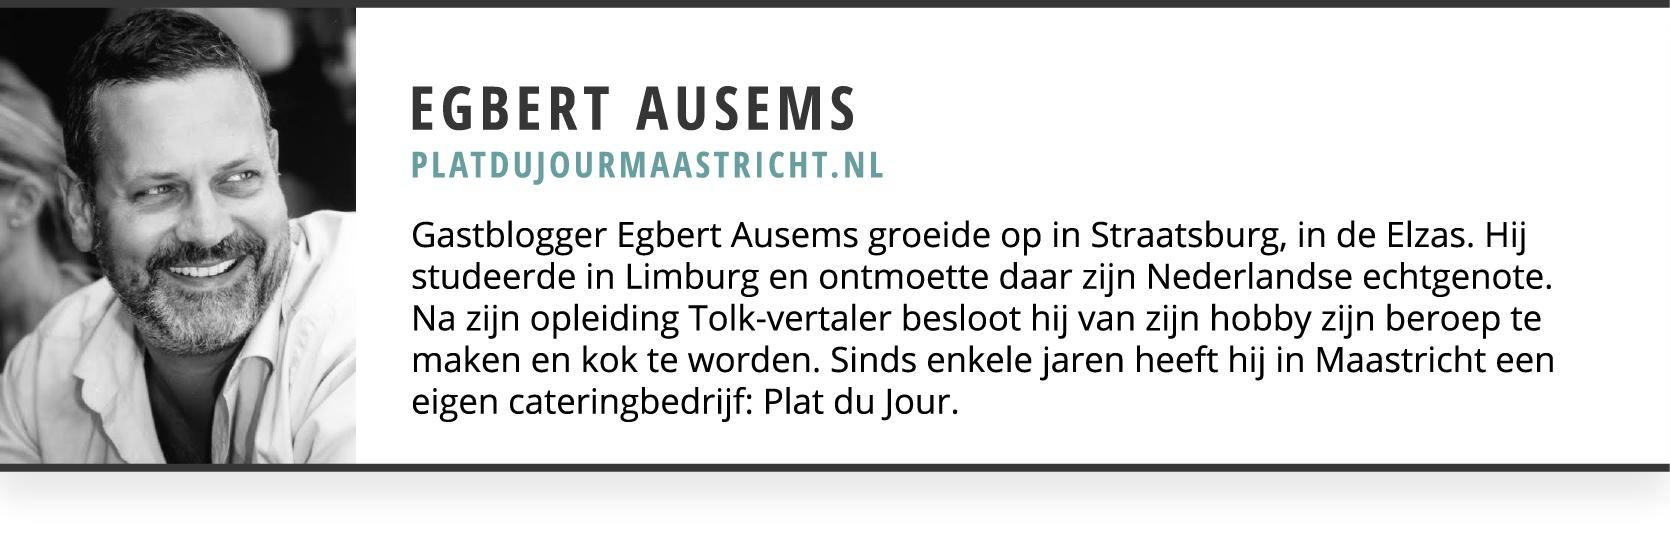 Egbert-Ausems-NL.jpg